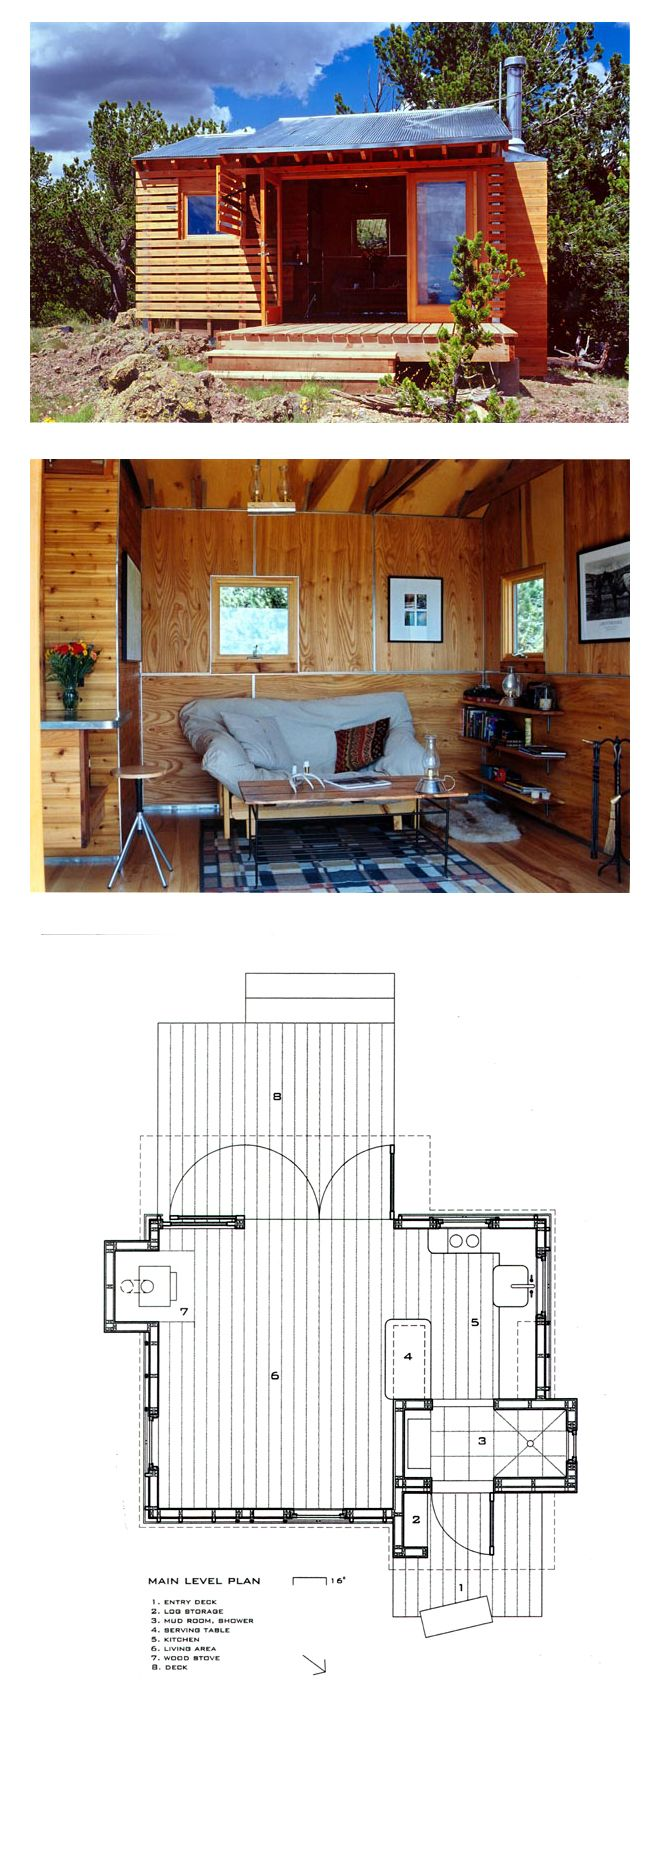 61 best Tiny House Plans images on Pinterest | Arquitetura, Cool ...